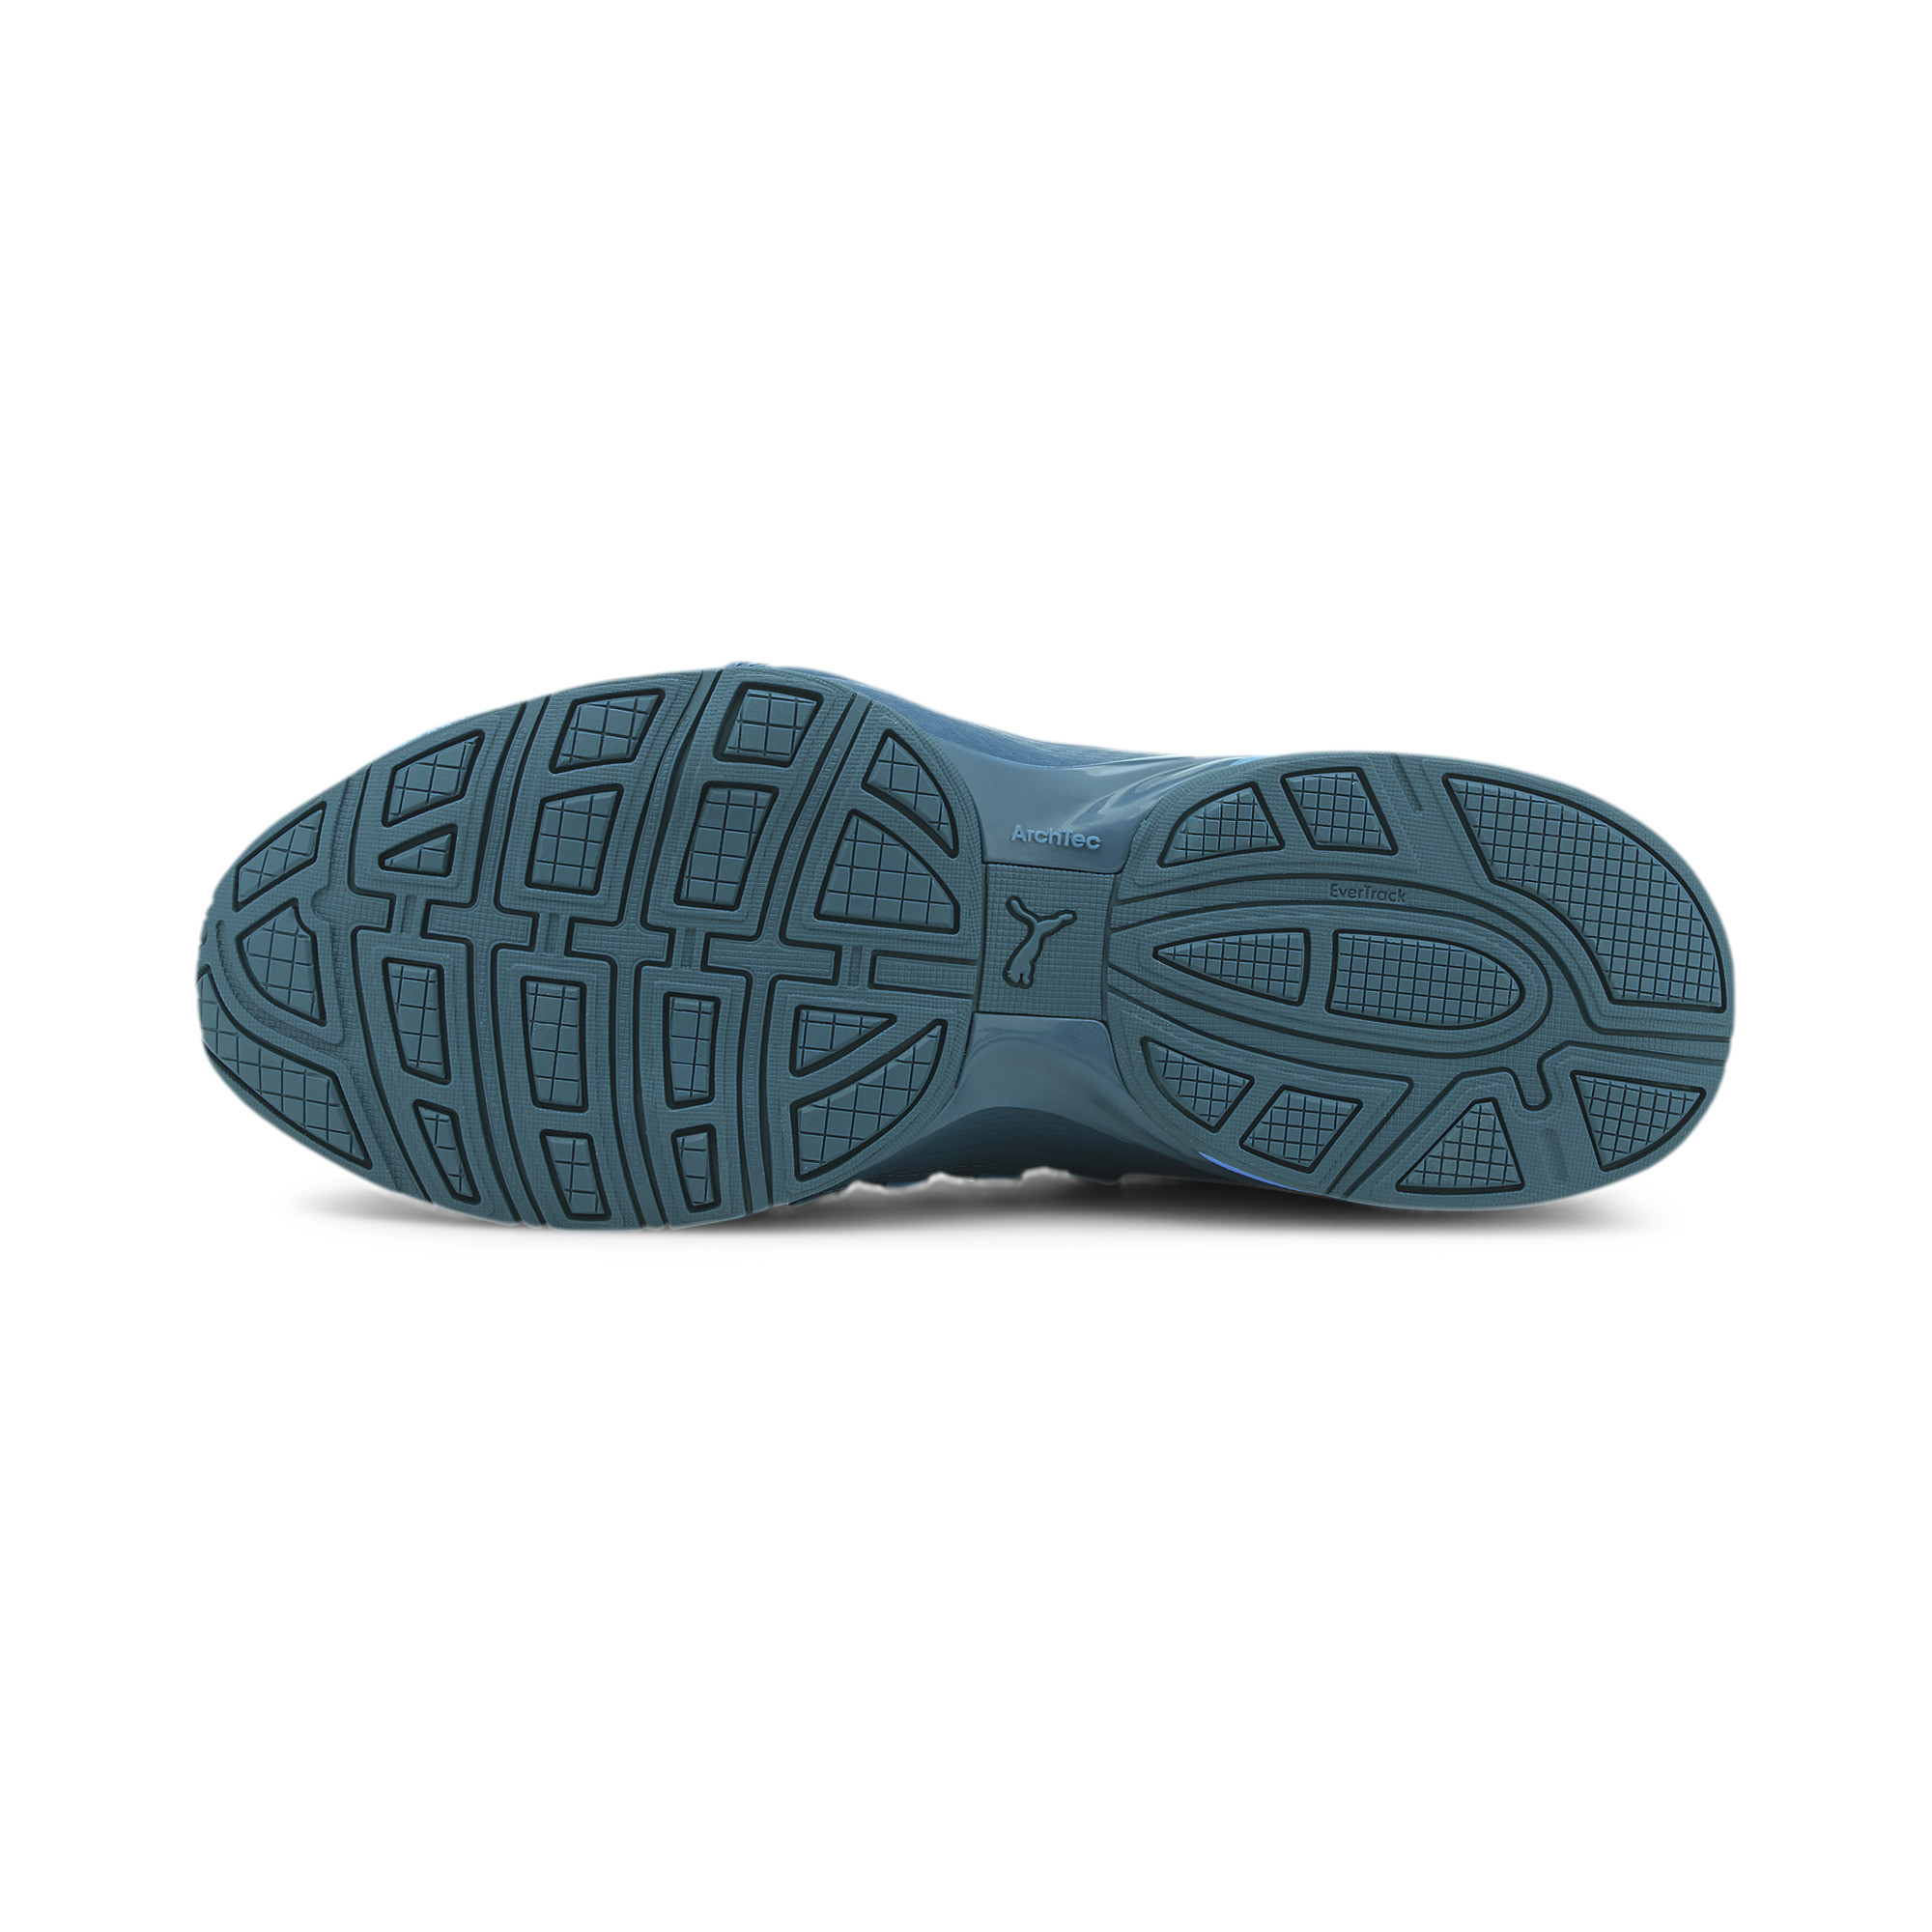 PUMA-Men-039-s-Axelion-Ultra-Running-Shoes thumbnail 20